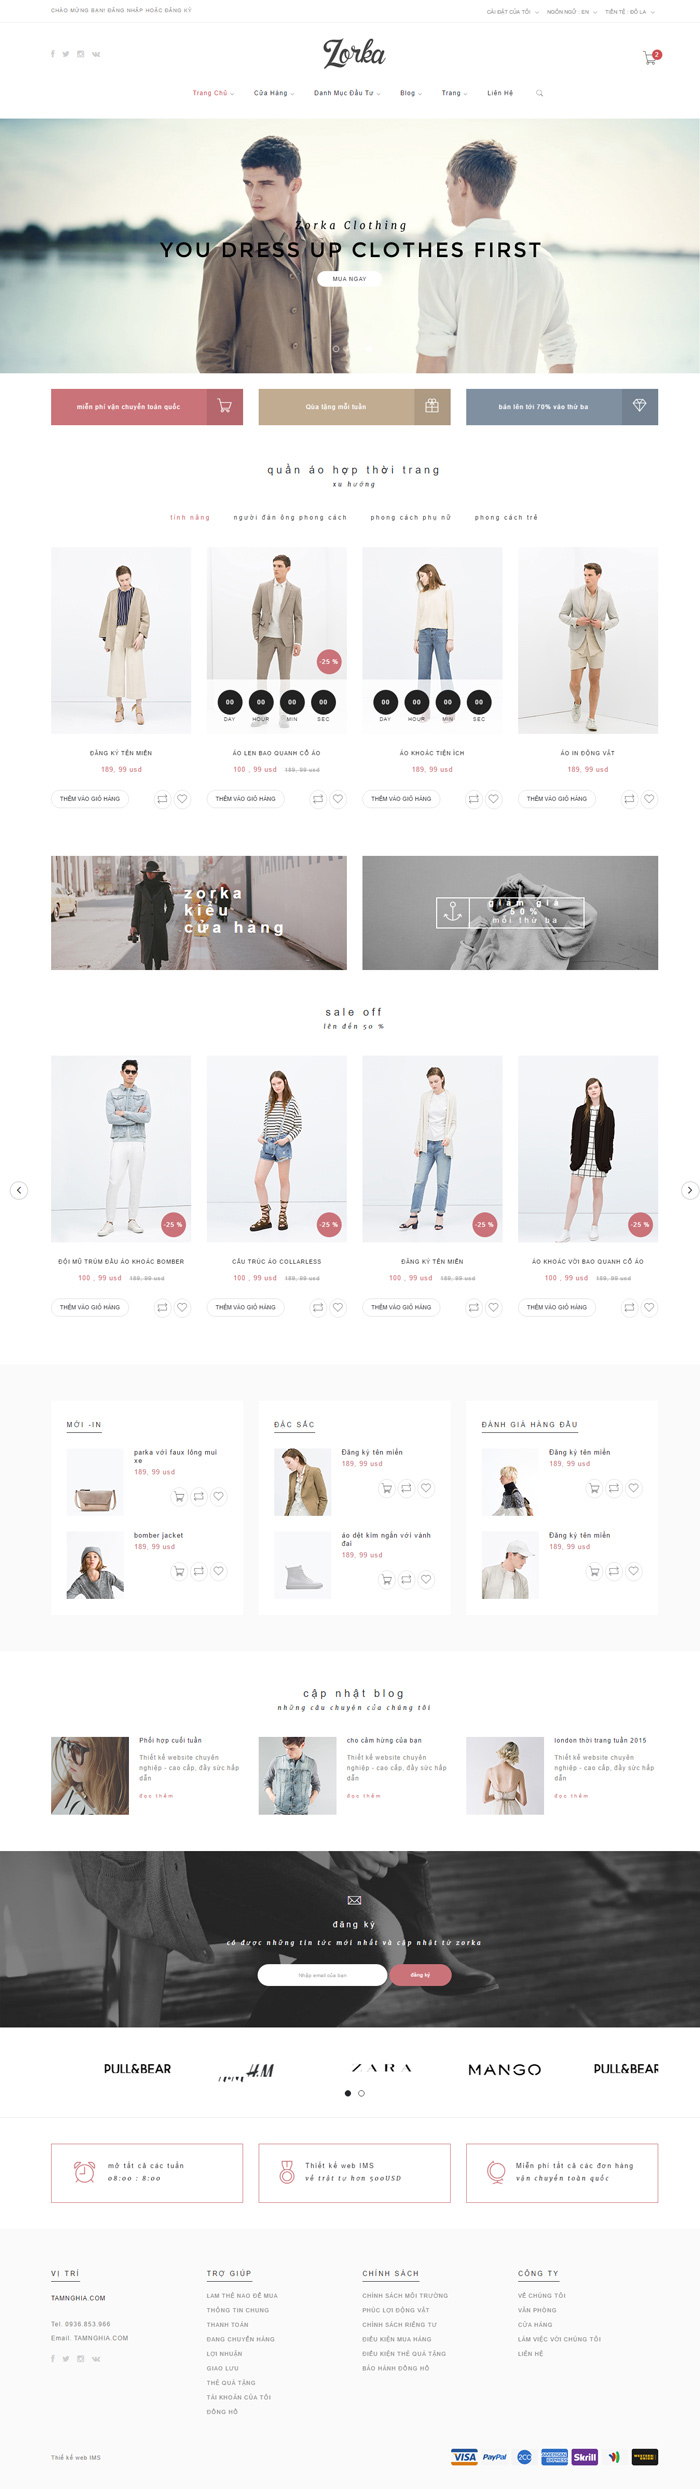 Website Thời trang thanh lịch